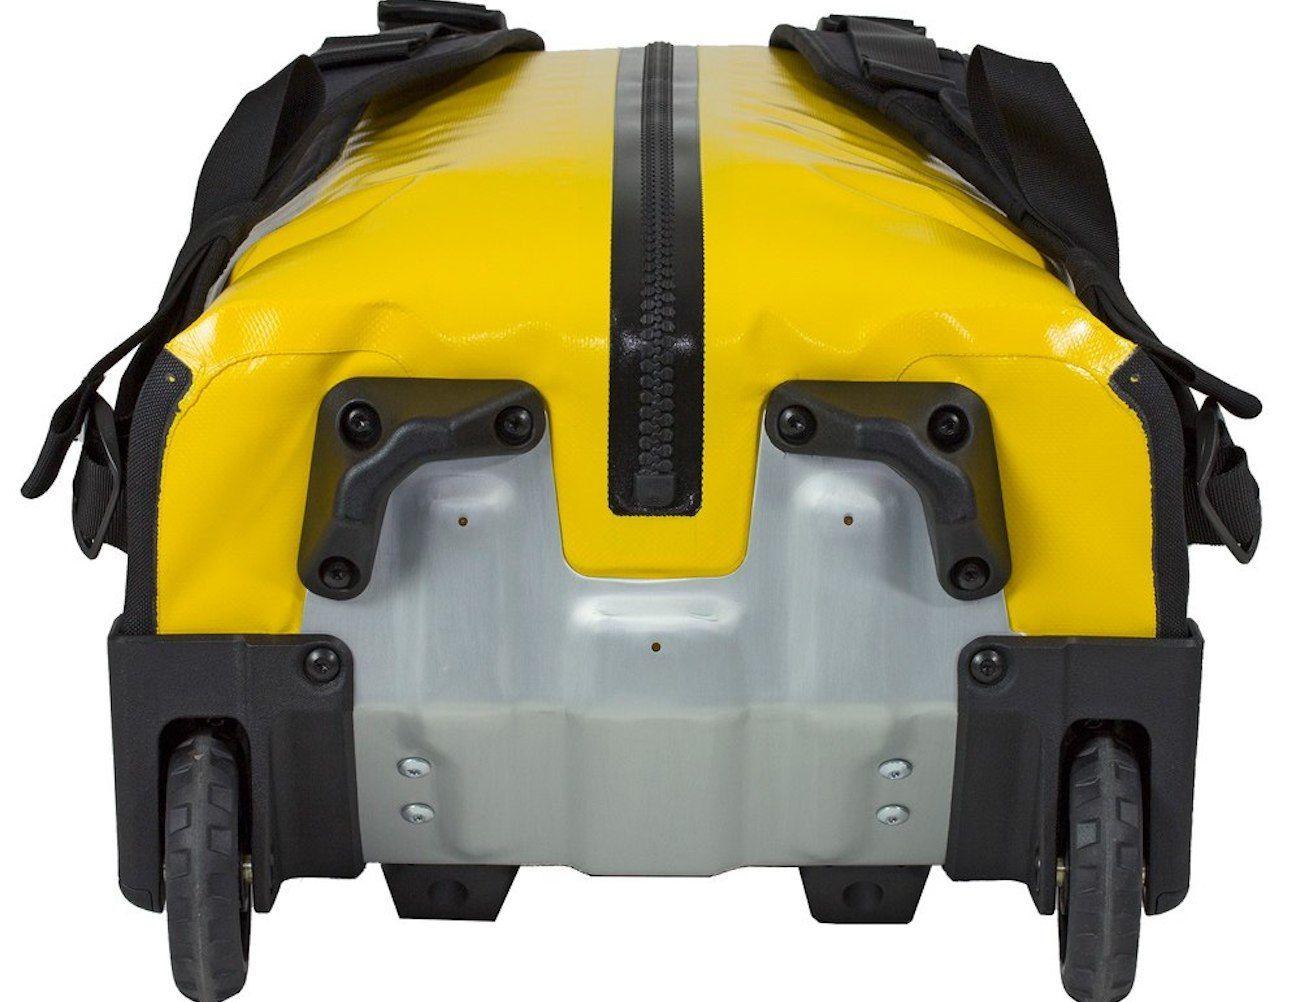 Ortlieb RG Wheeled Duffel Bag